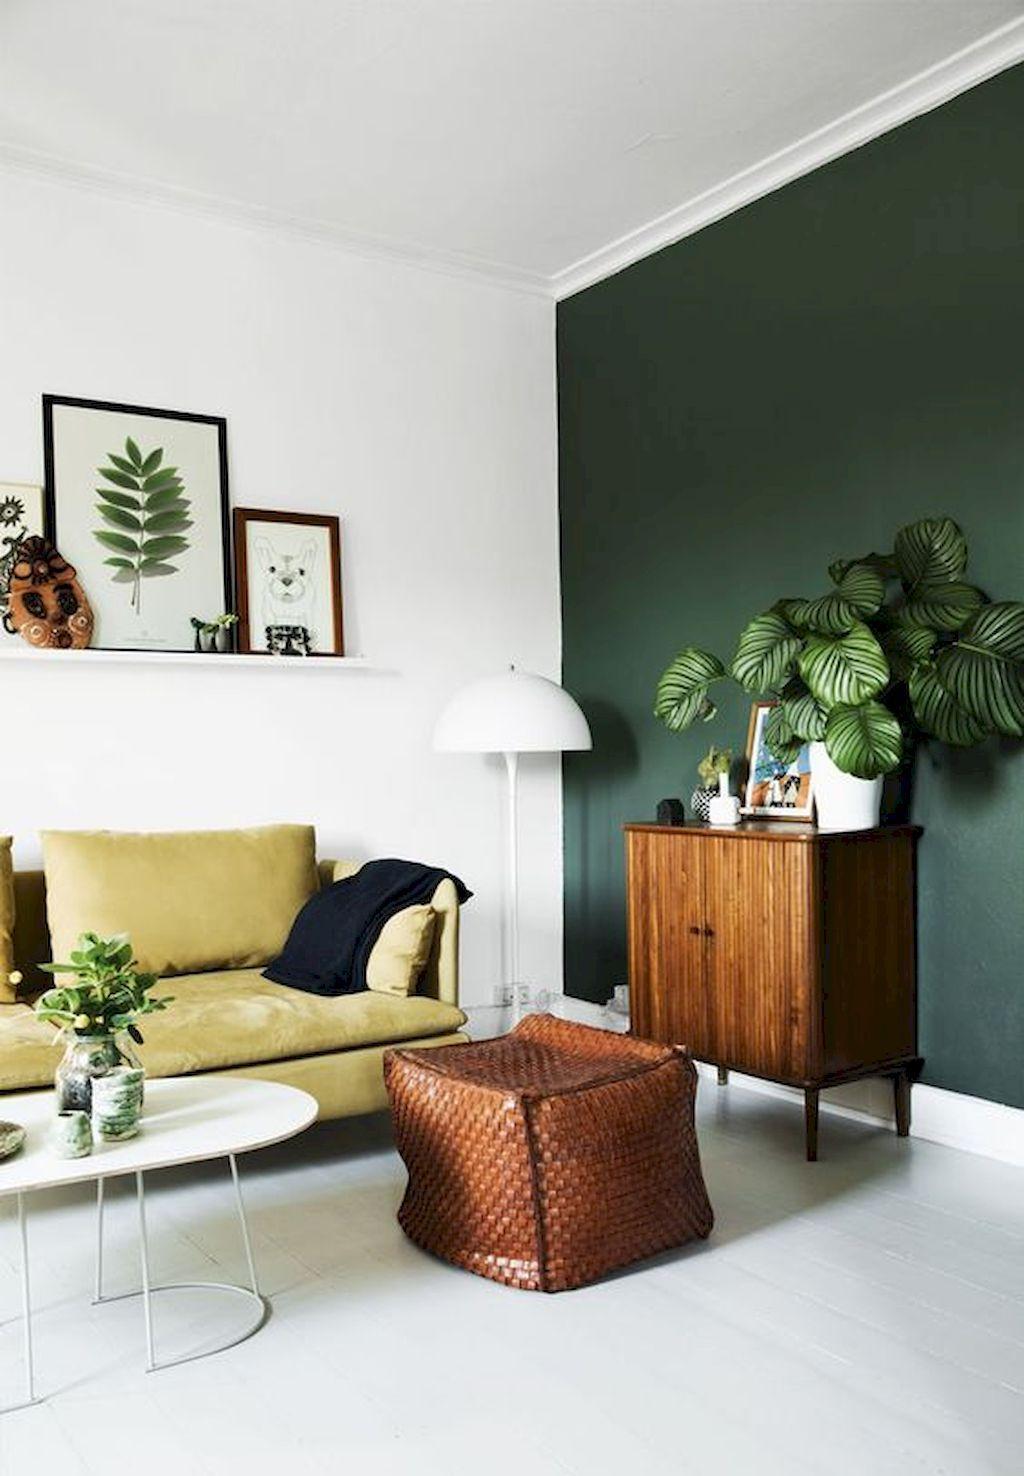 85 Cool Scandinavian Style Living Room Decor And Design Ideas Green Accent WallsGreen